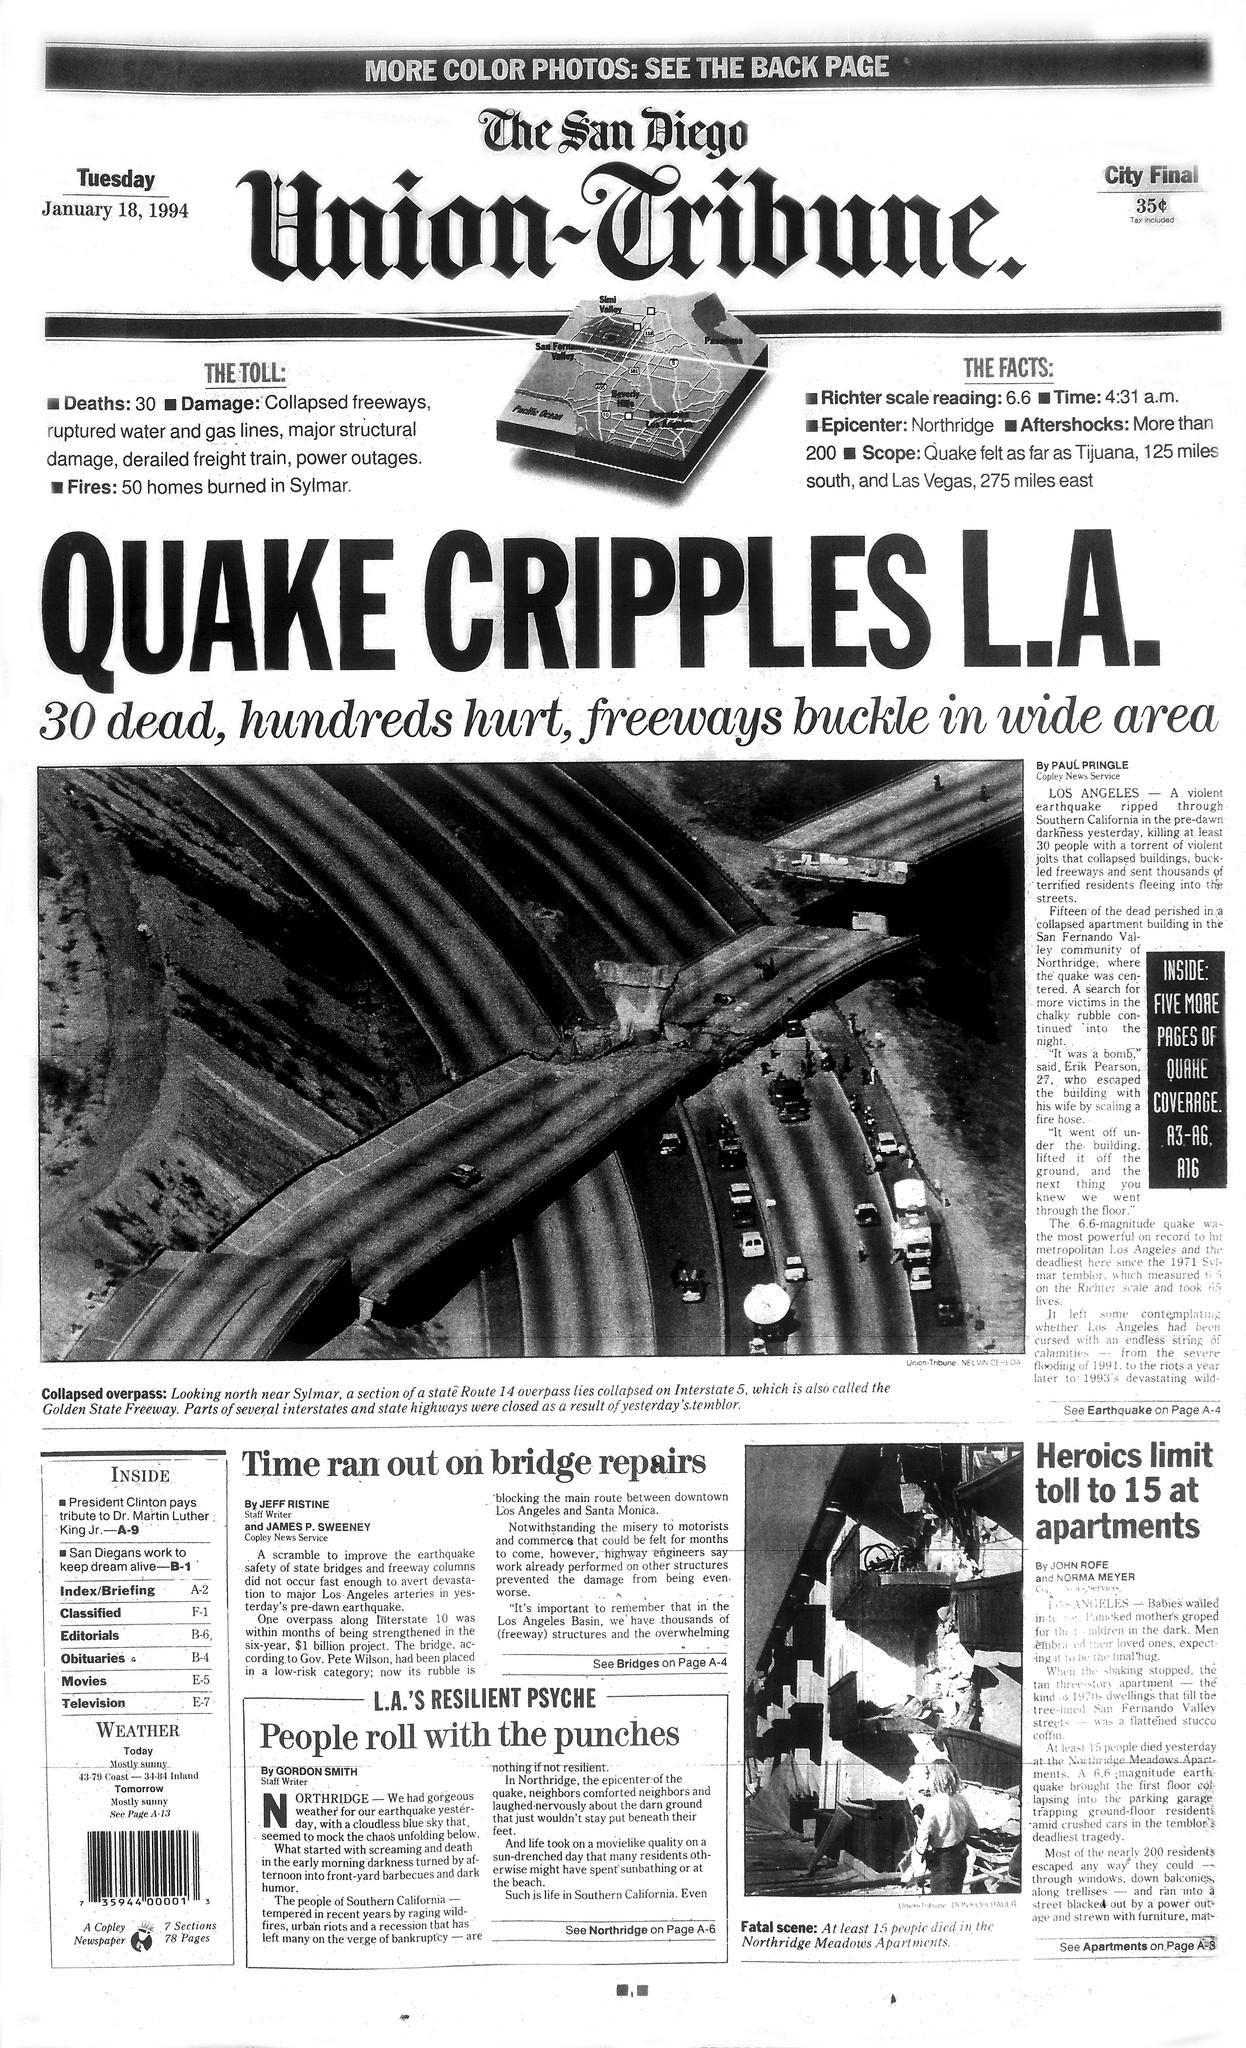 January 18, 1994